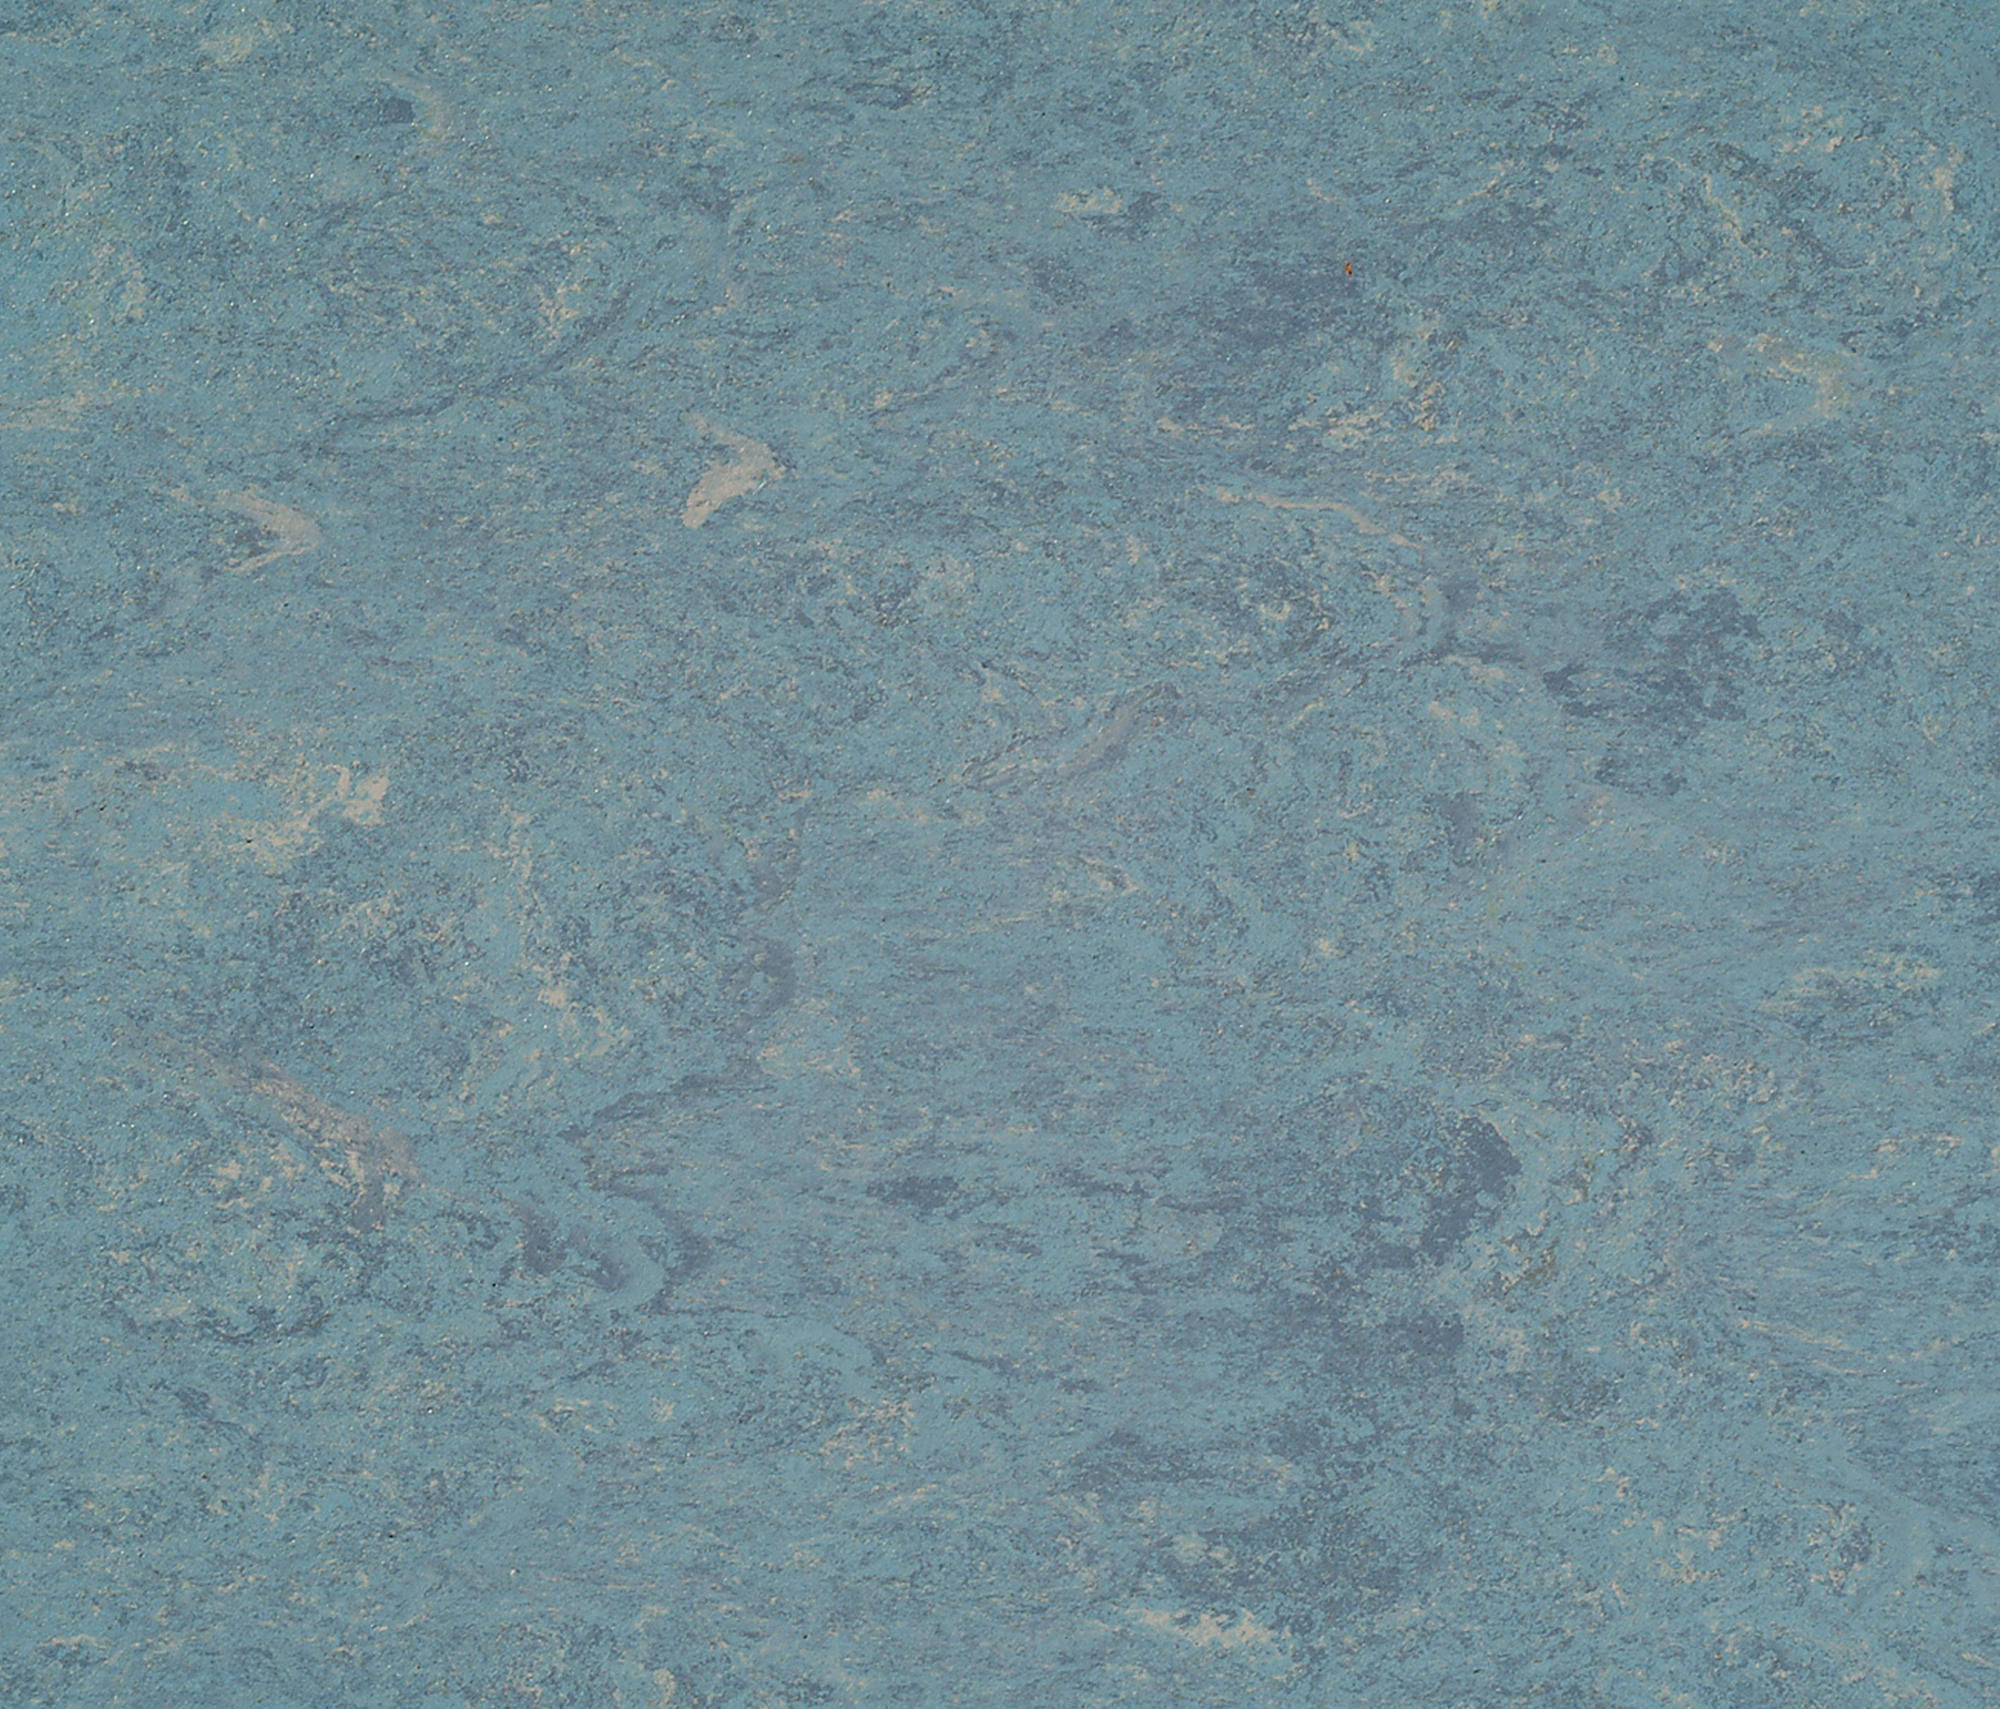 marmorette acoustic lpx 121 023 linoleum flooring from. Black Bedroom Furniture Sets. Home Design Ideas